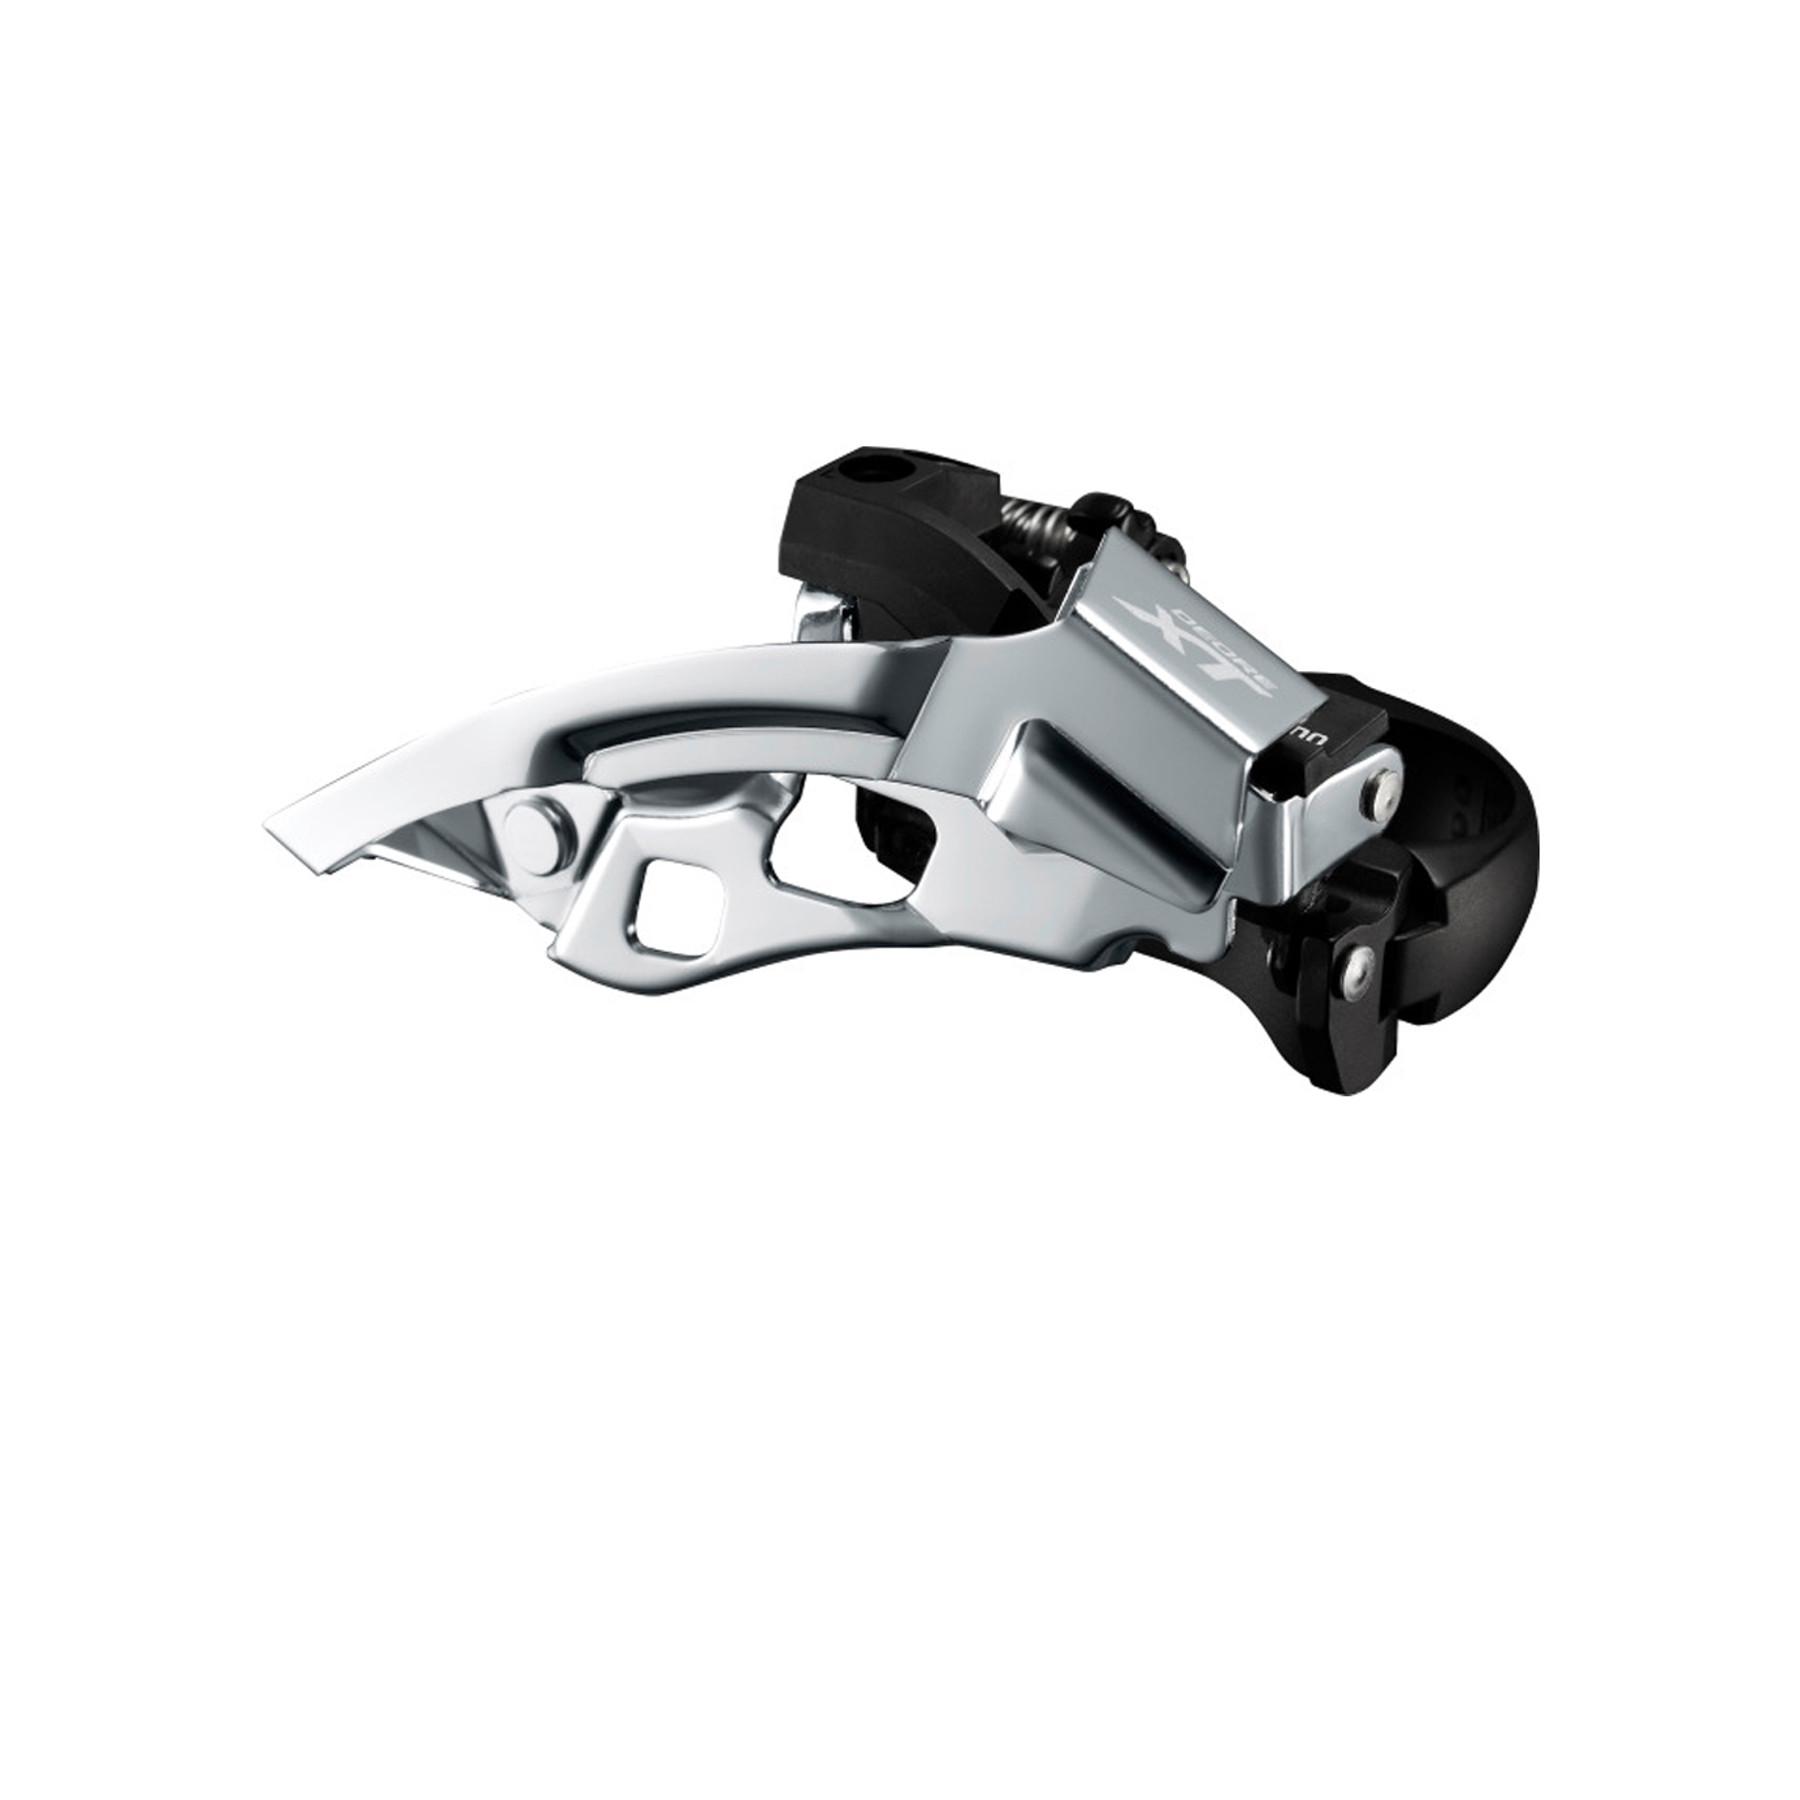 Shimano XT Trekking Umwerfer FD-T8000 top swing